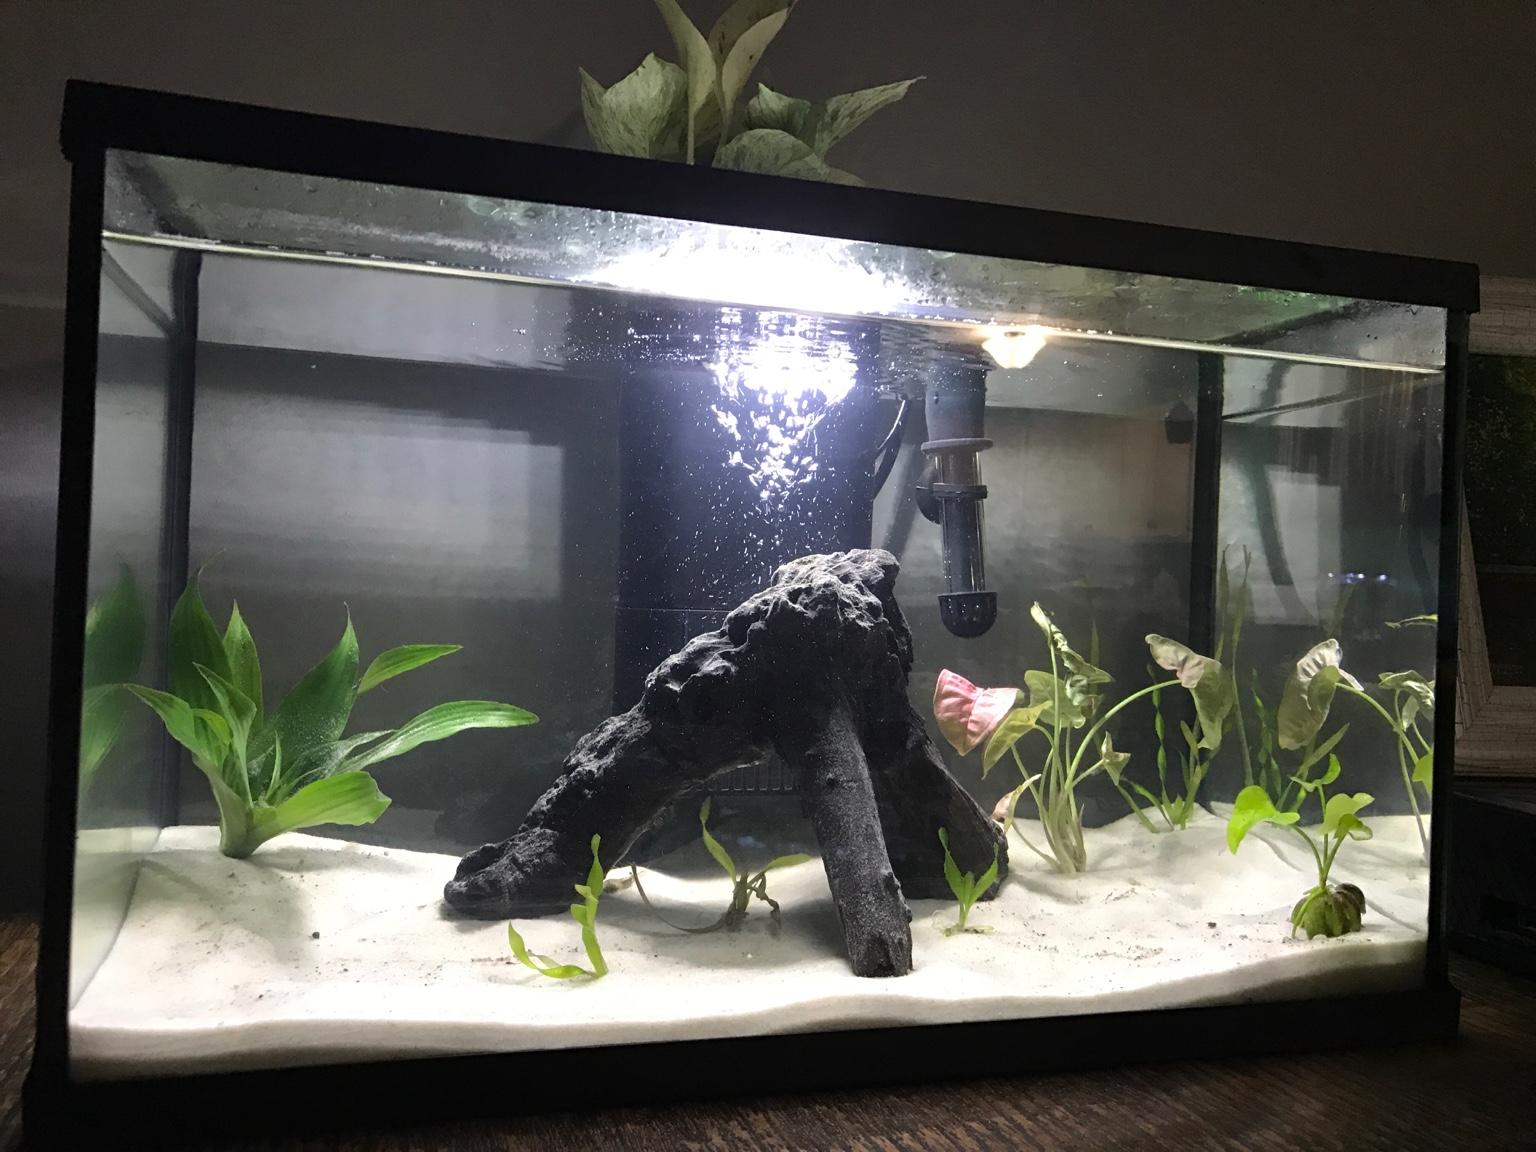 Fish tank volume calculator inches - Fish Tank Volume Calculator Inches